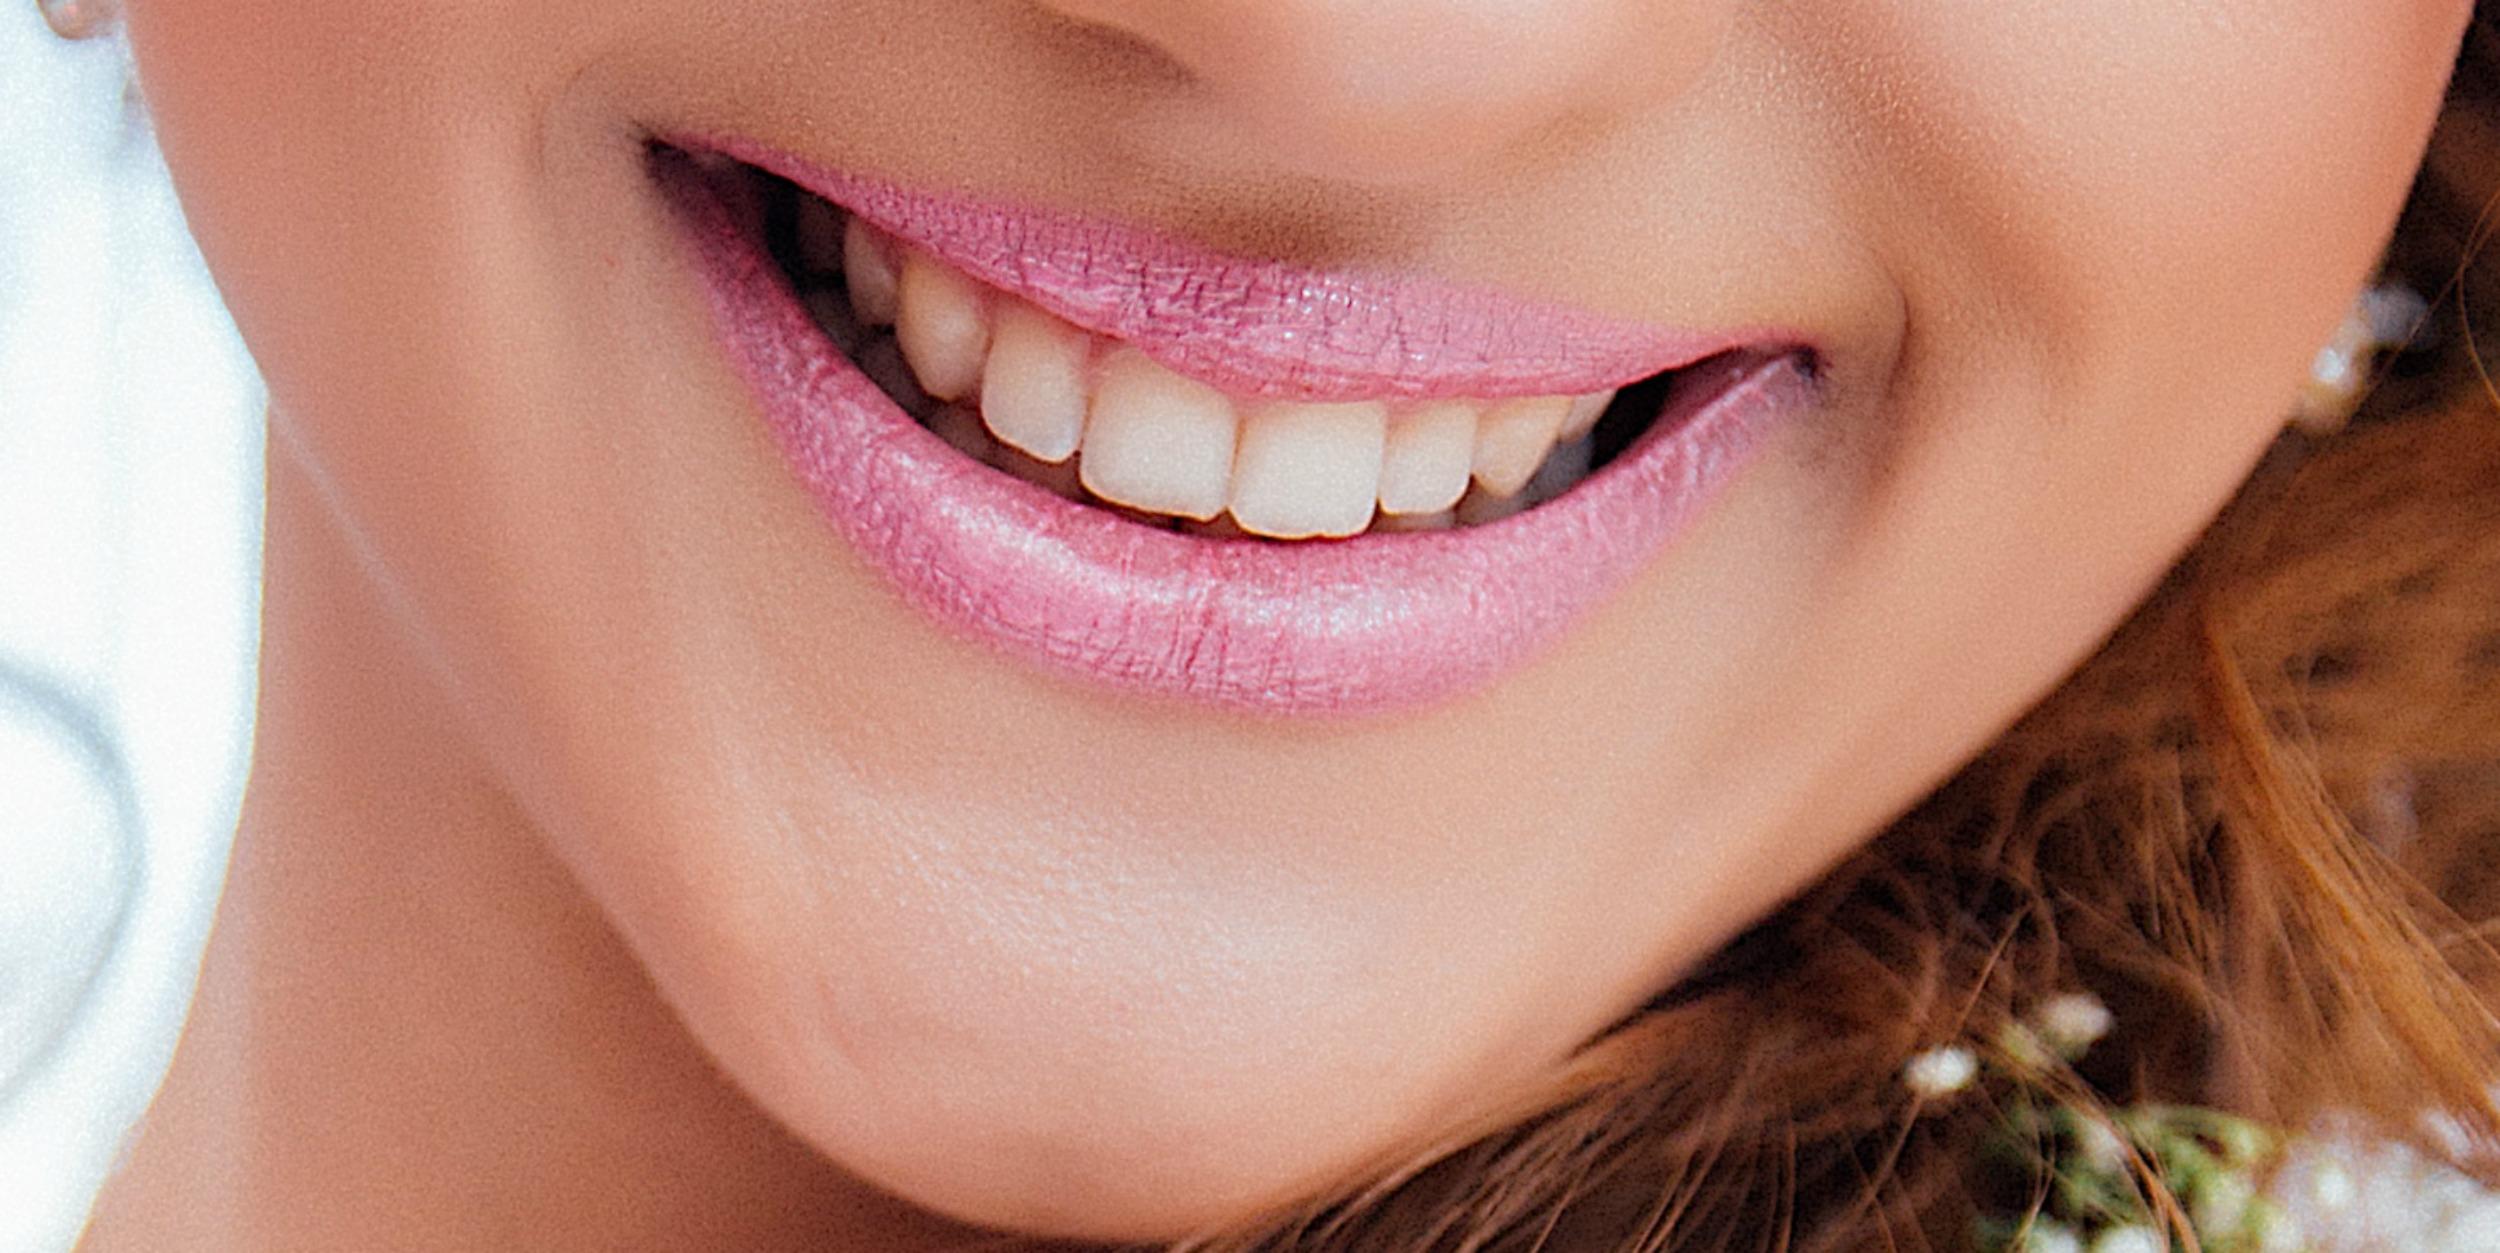 smile_pink.jpg